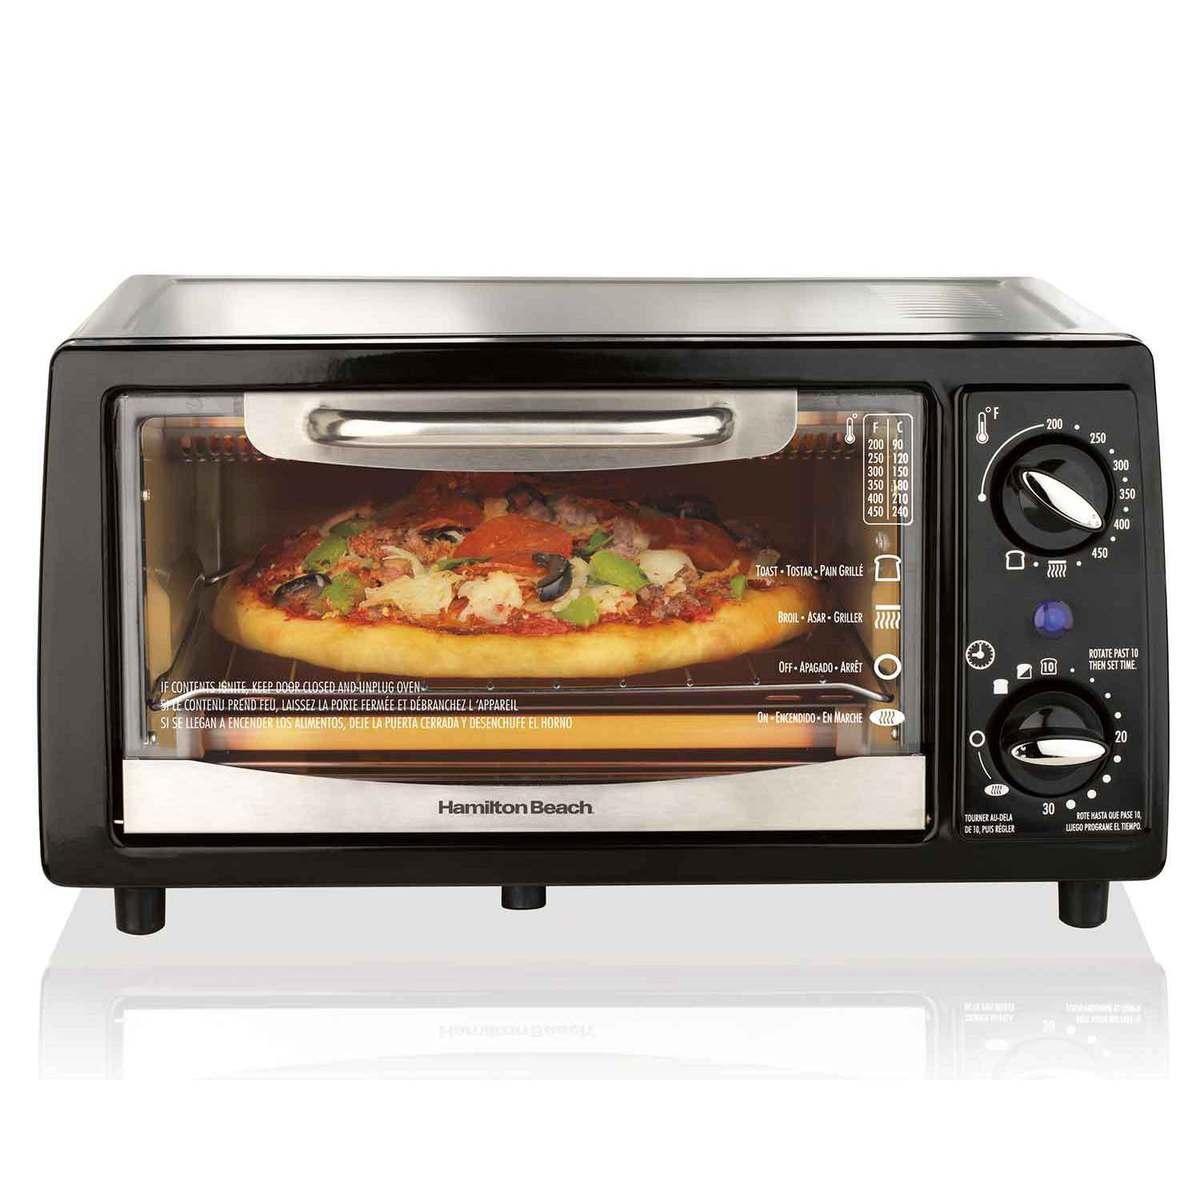 4 Slice Toaster Oven (31136)